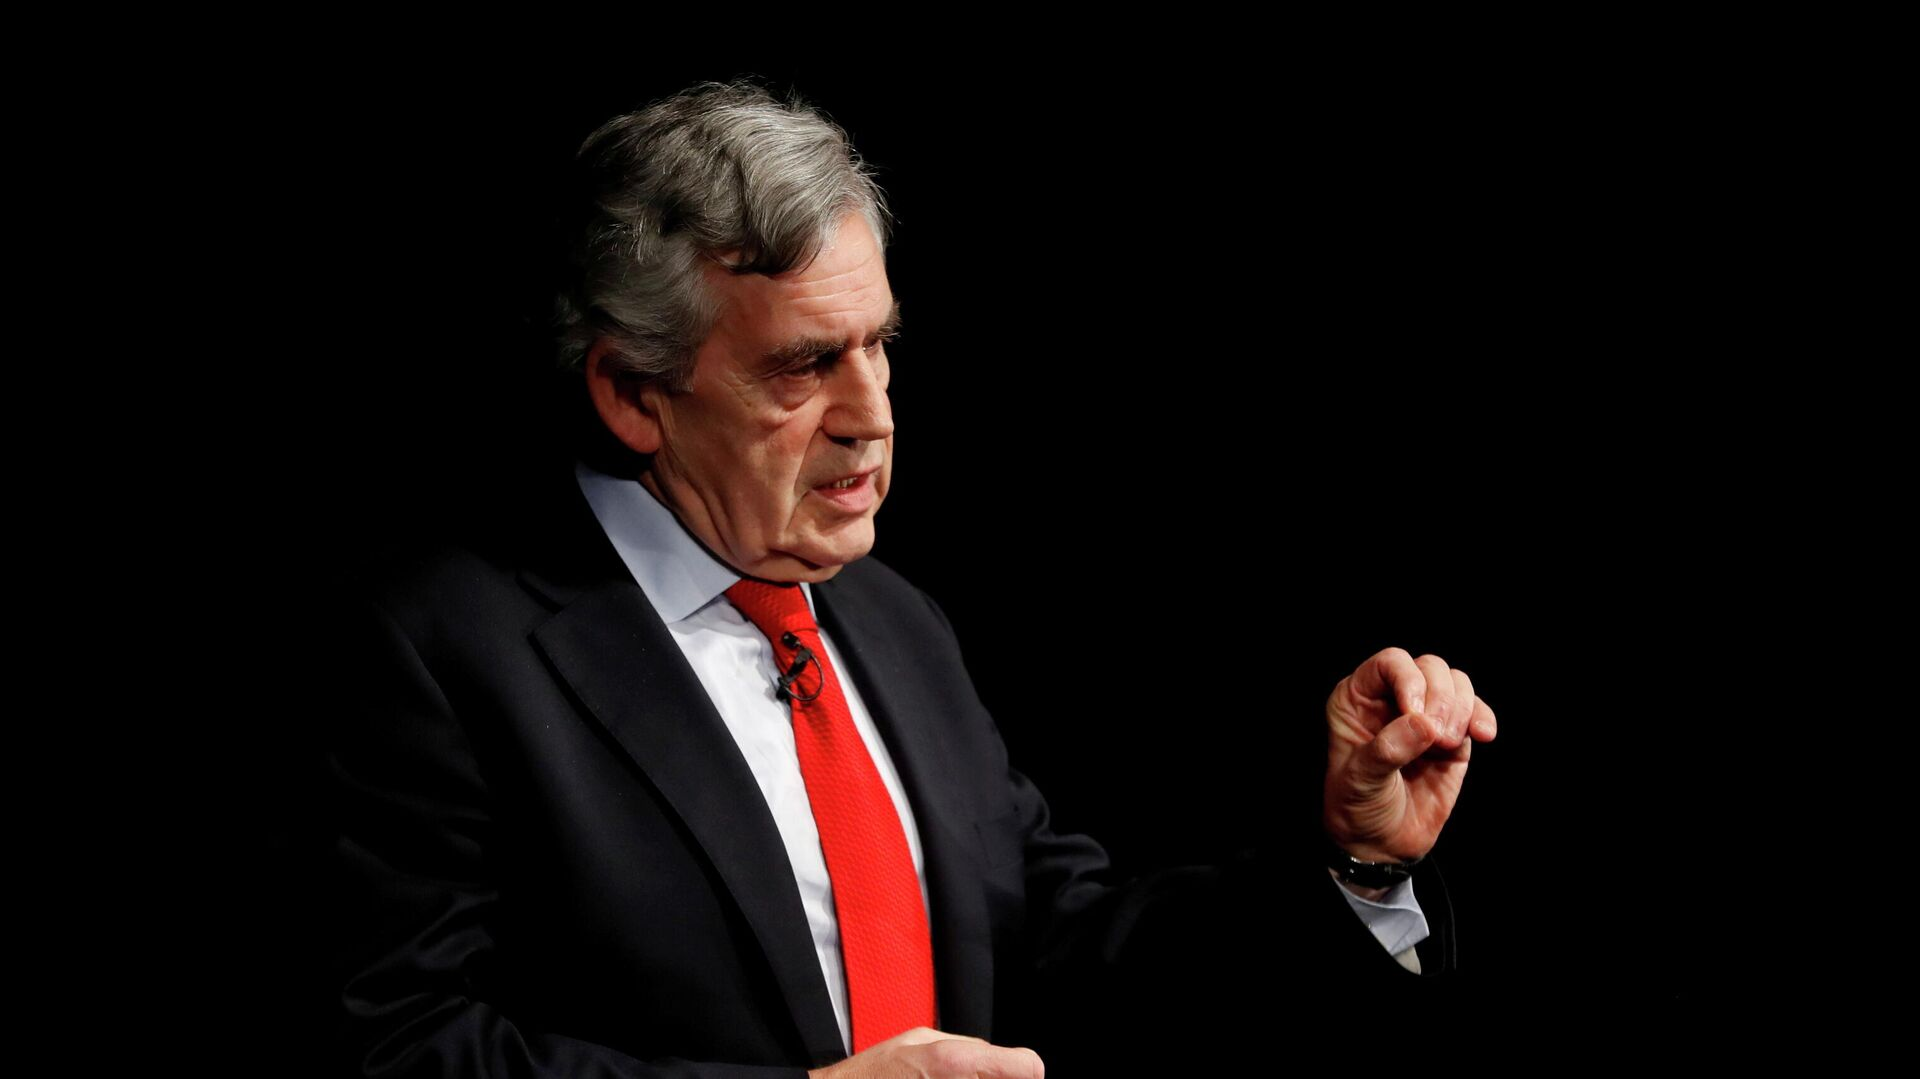 Britain's former Prime Minister Gordon Brown speaks at an event in Edinburgh, Scotland, Britain January 17, 2019. - Sputnik International, 1920, 20.09.2021